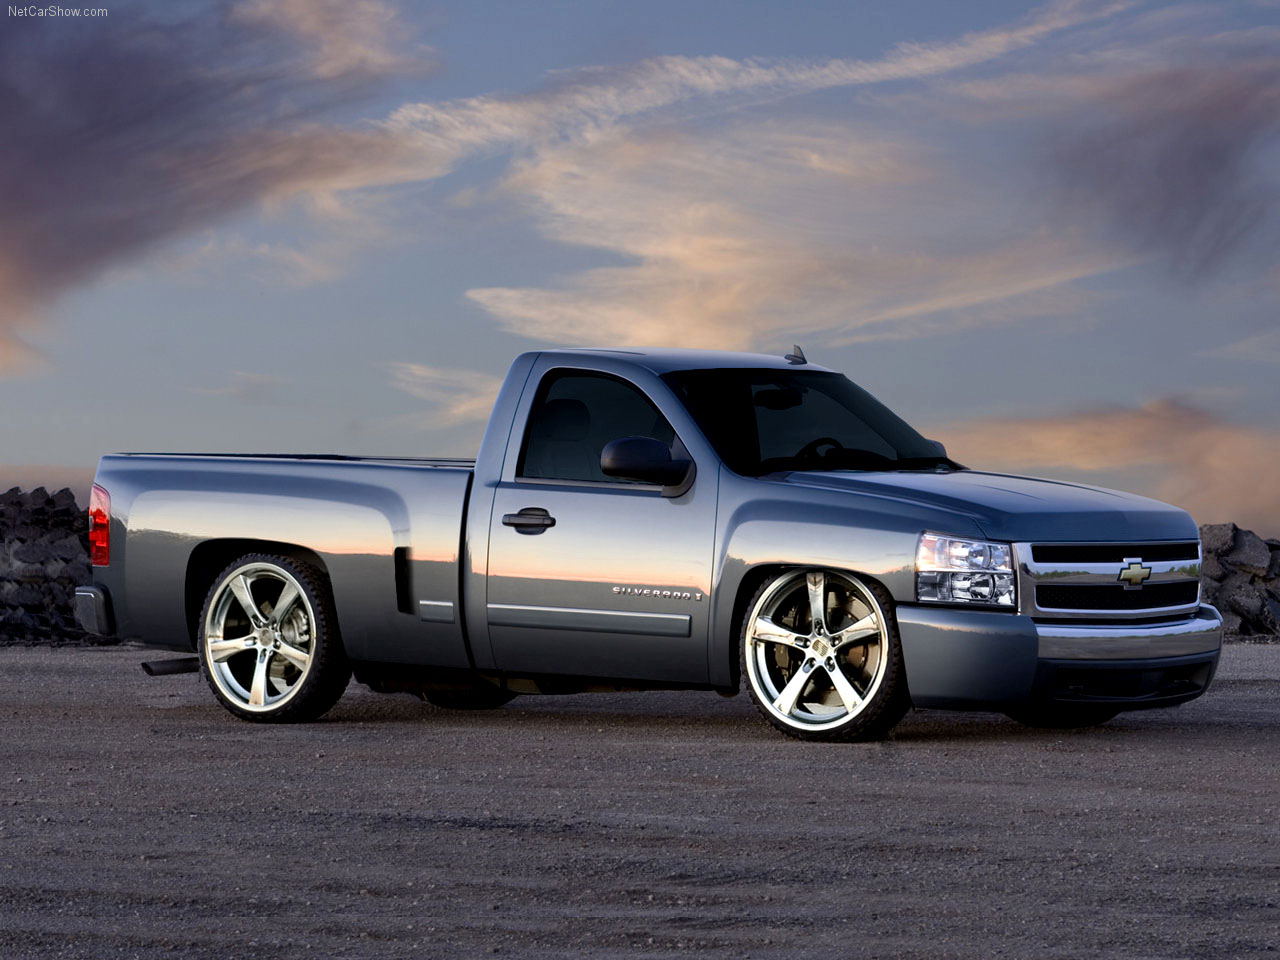 http://2.bp.blogspot.com/_5YsZvIcPKEI/TUDK5JPMseI/AAAAAAAAAMs/IE5CYFr95A8/s1600/15-1+Wallpaper+de+camioneta+Chevy+Silverado.jpg